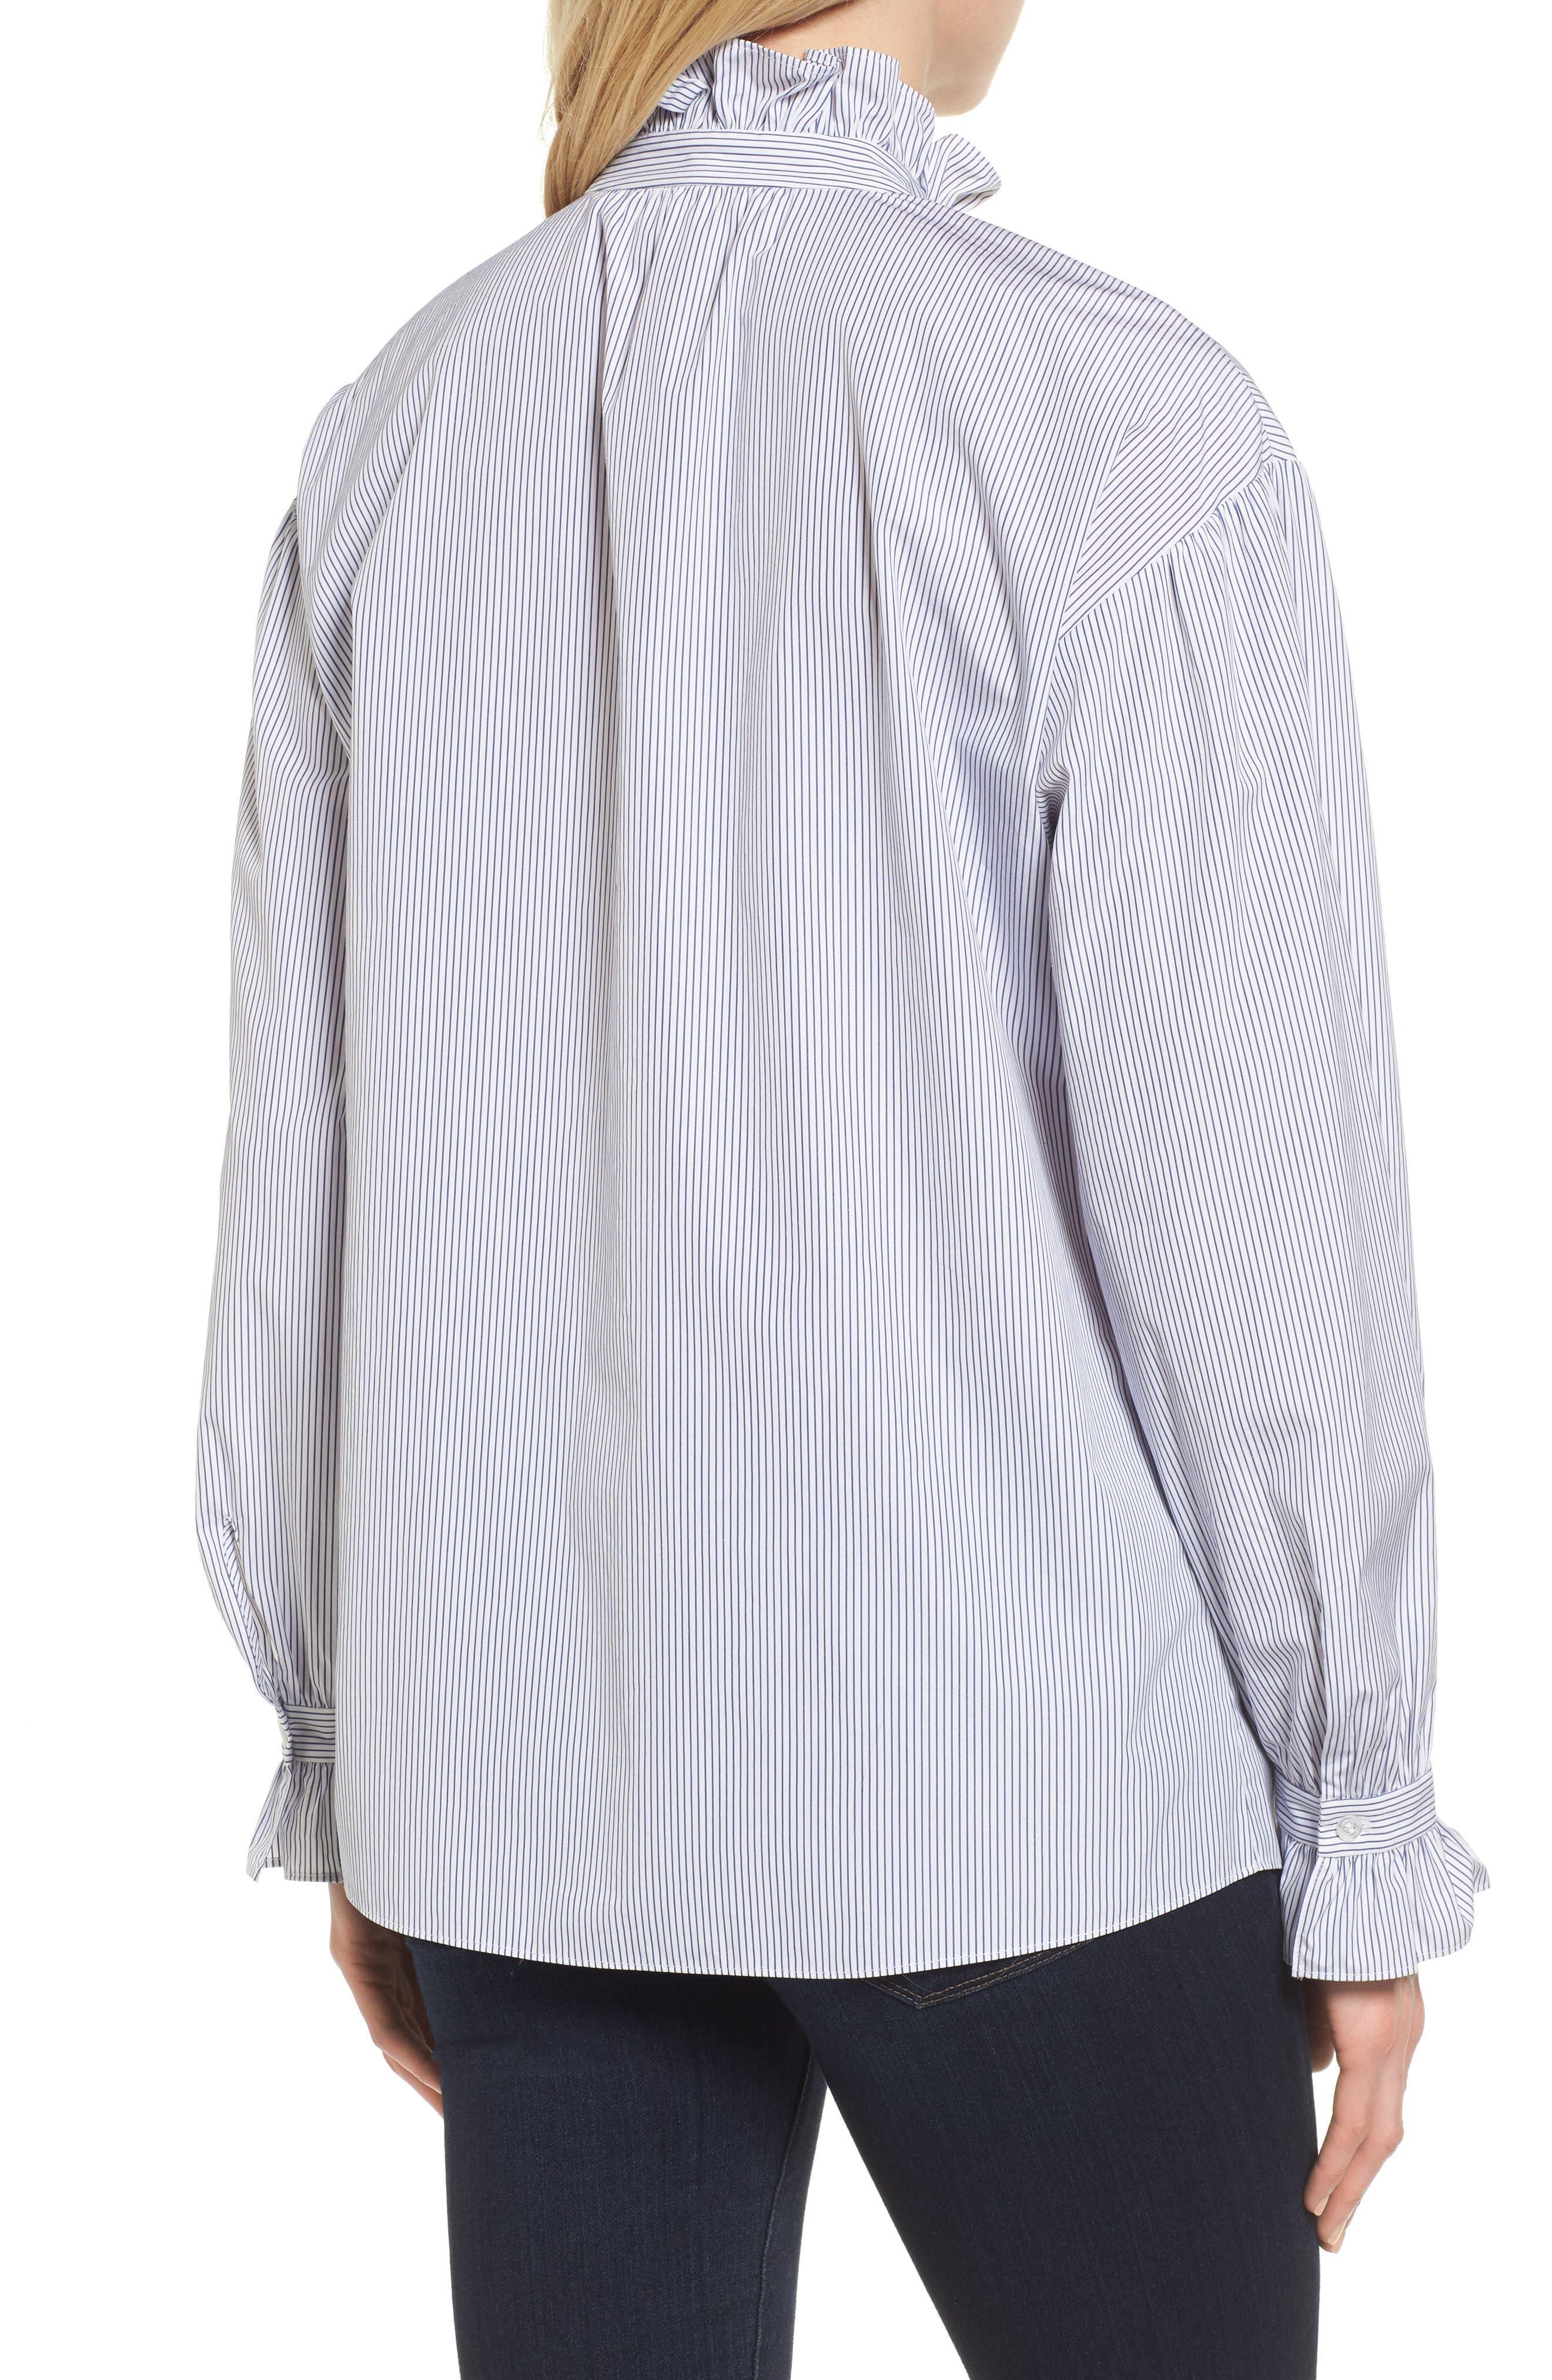 Ruffle Stripe Shirt,                             Alternate thumbnail 2, color,